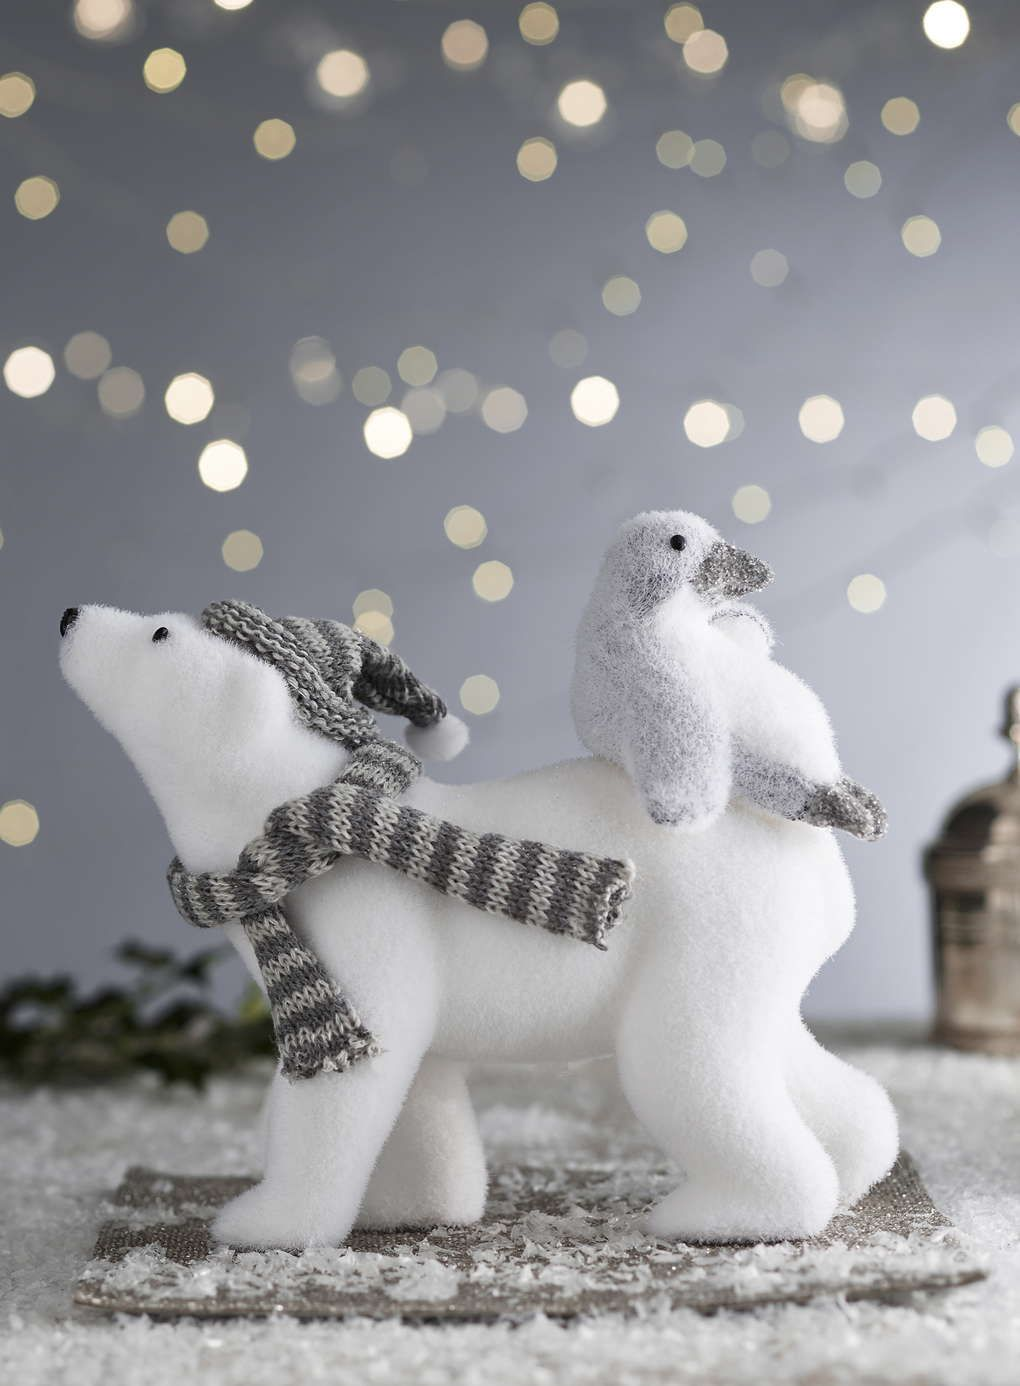 Snowy polar bear and penguin decoration - Christmas Decorations ...